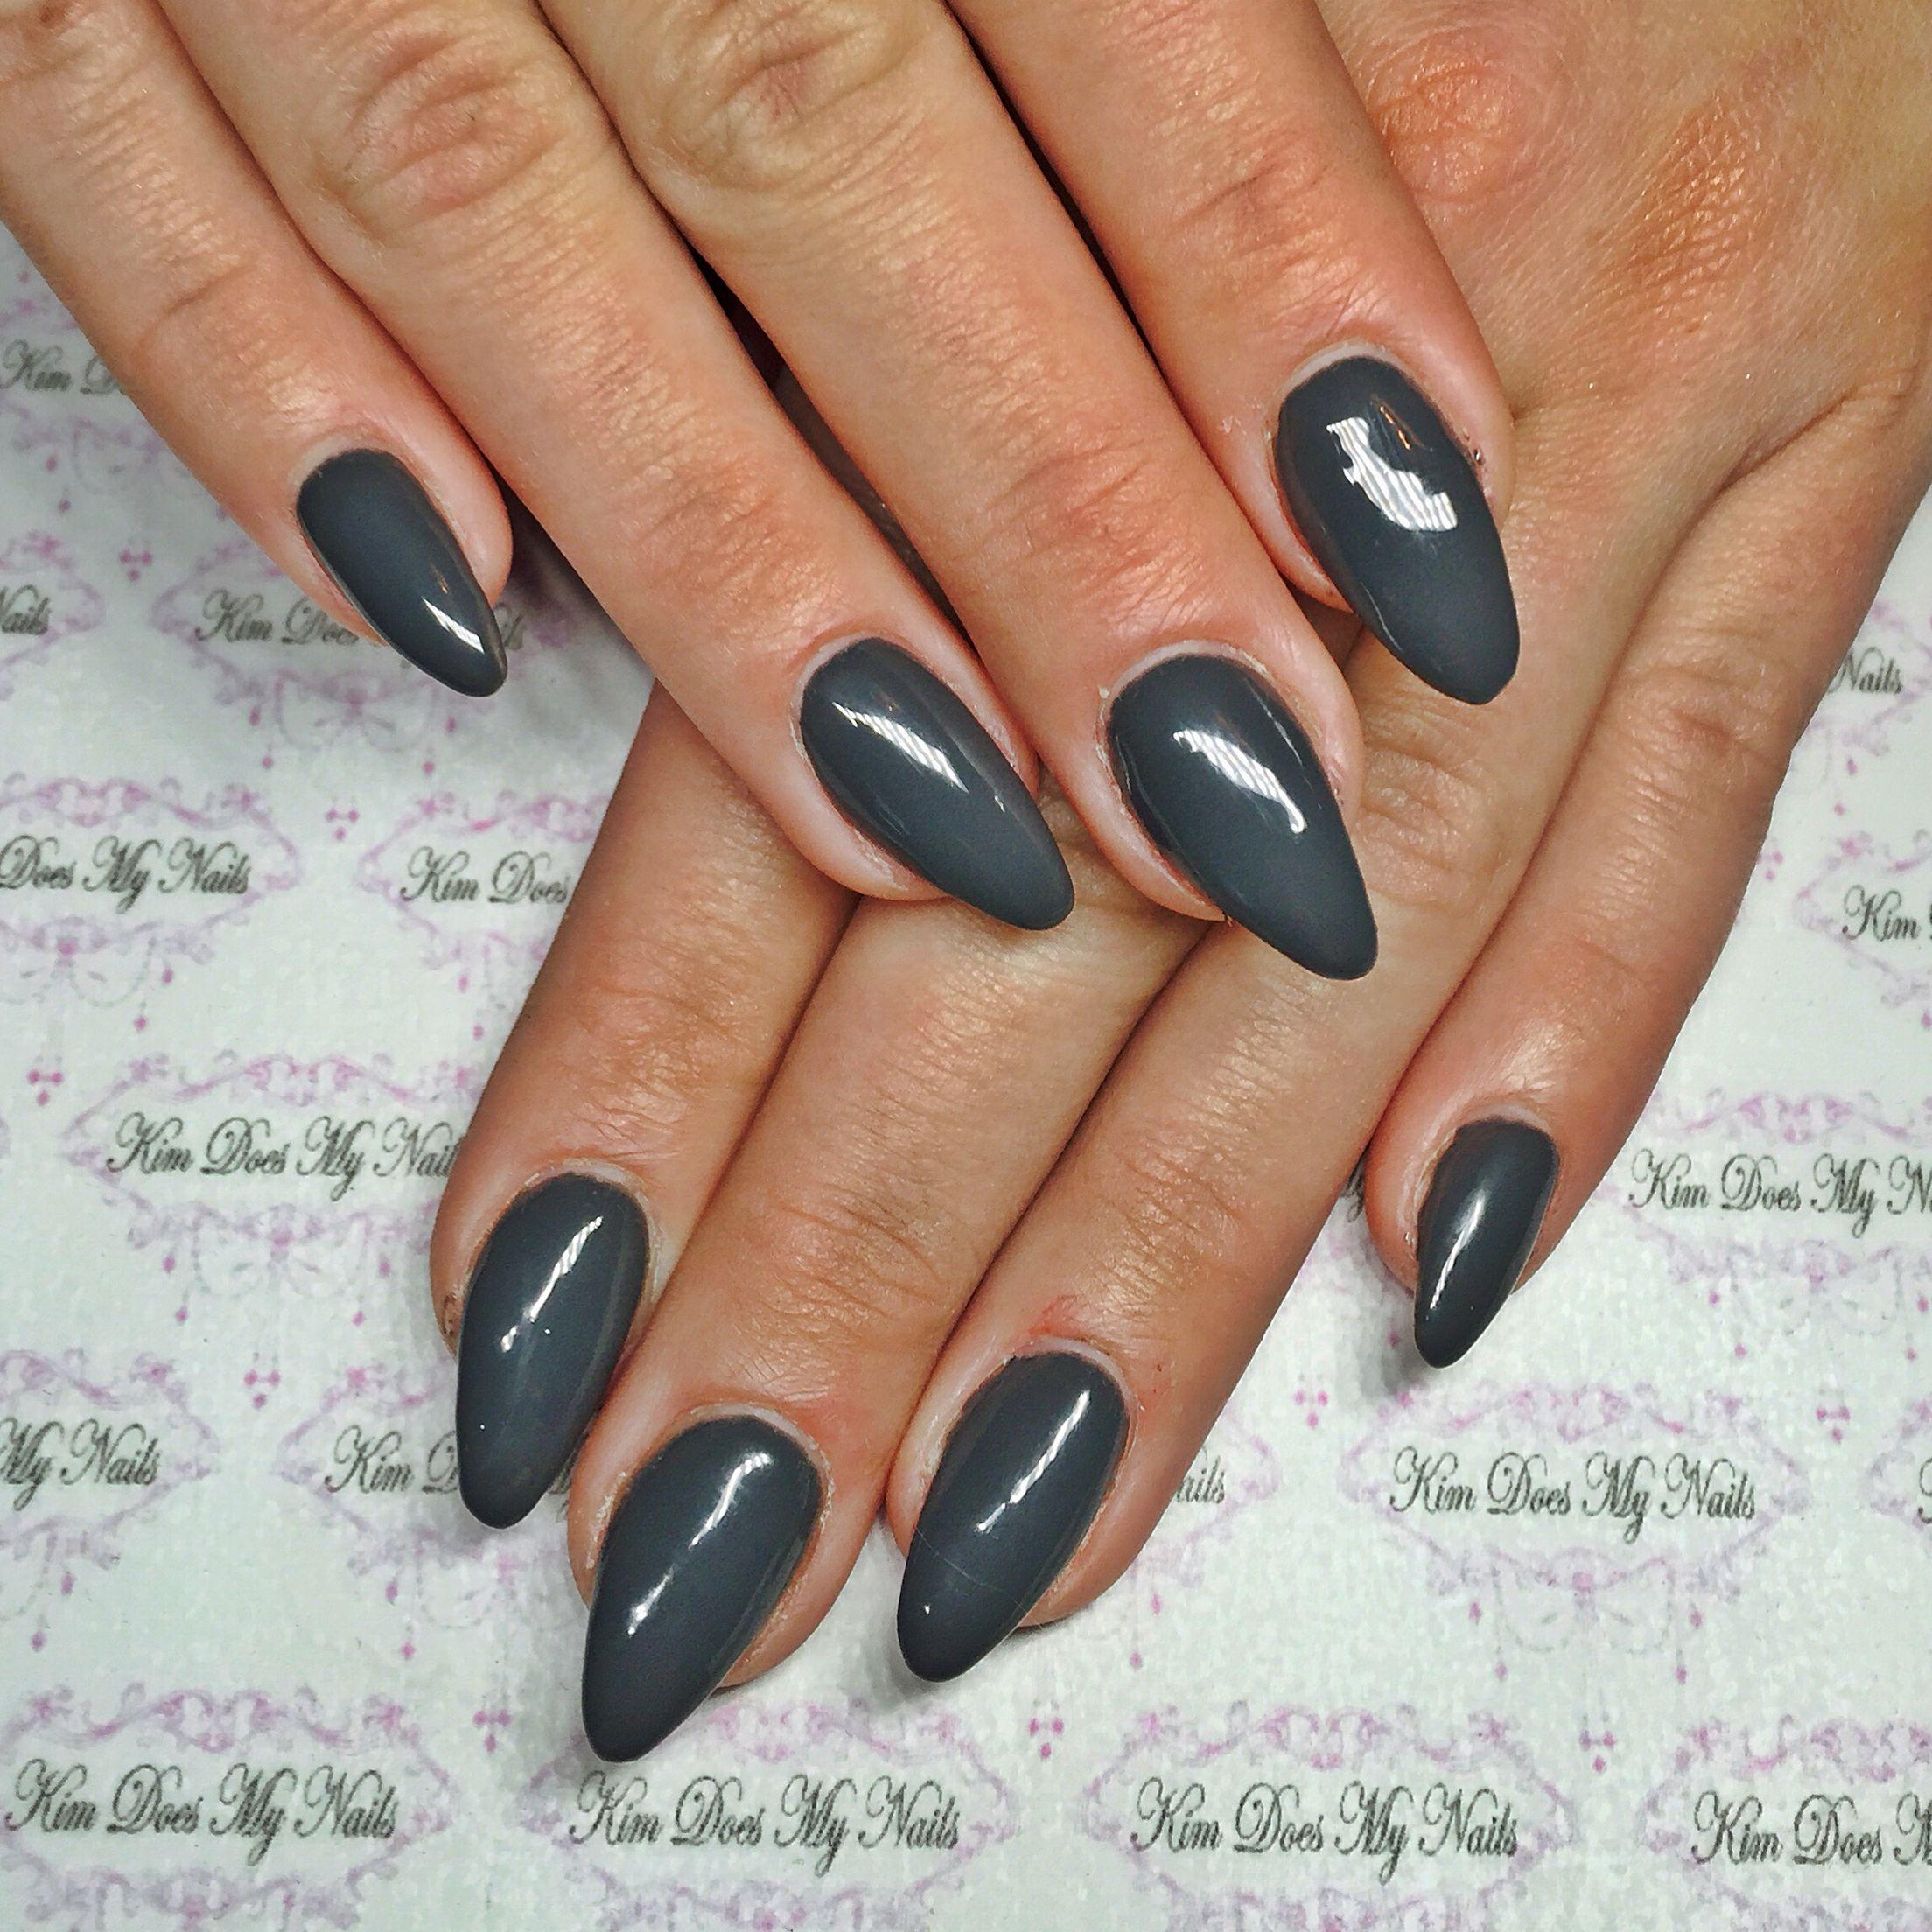 Charcoal grey nails #kimdoesmynails | Kim Does My Nails | Pinterest ...